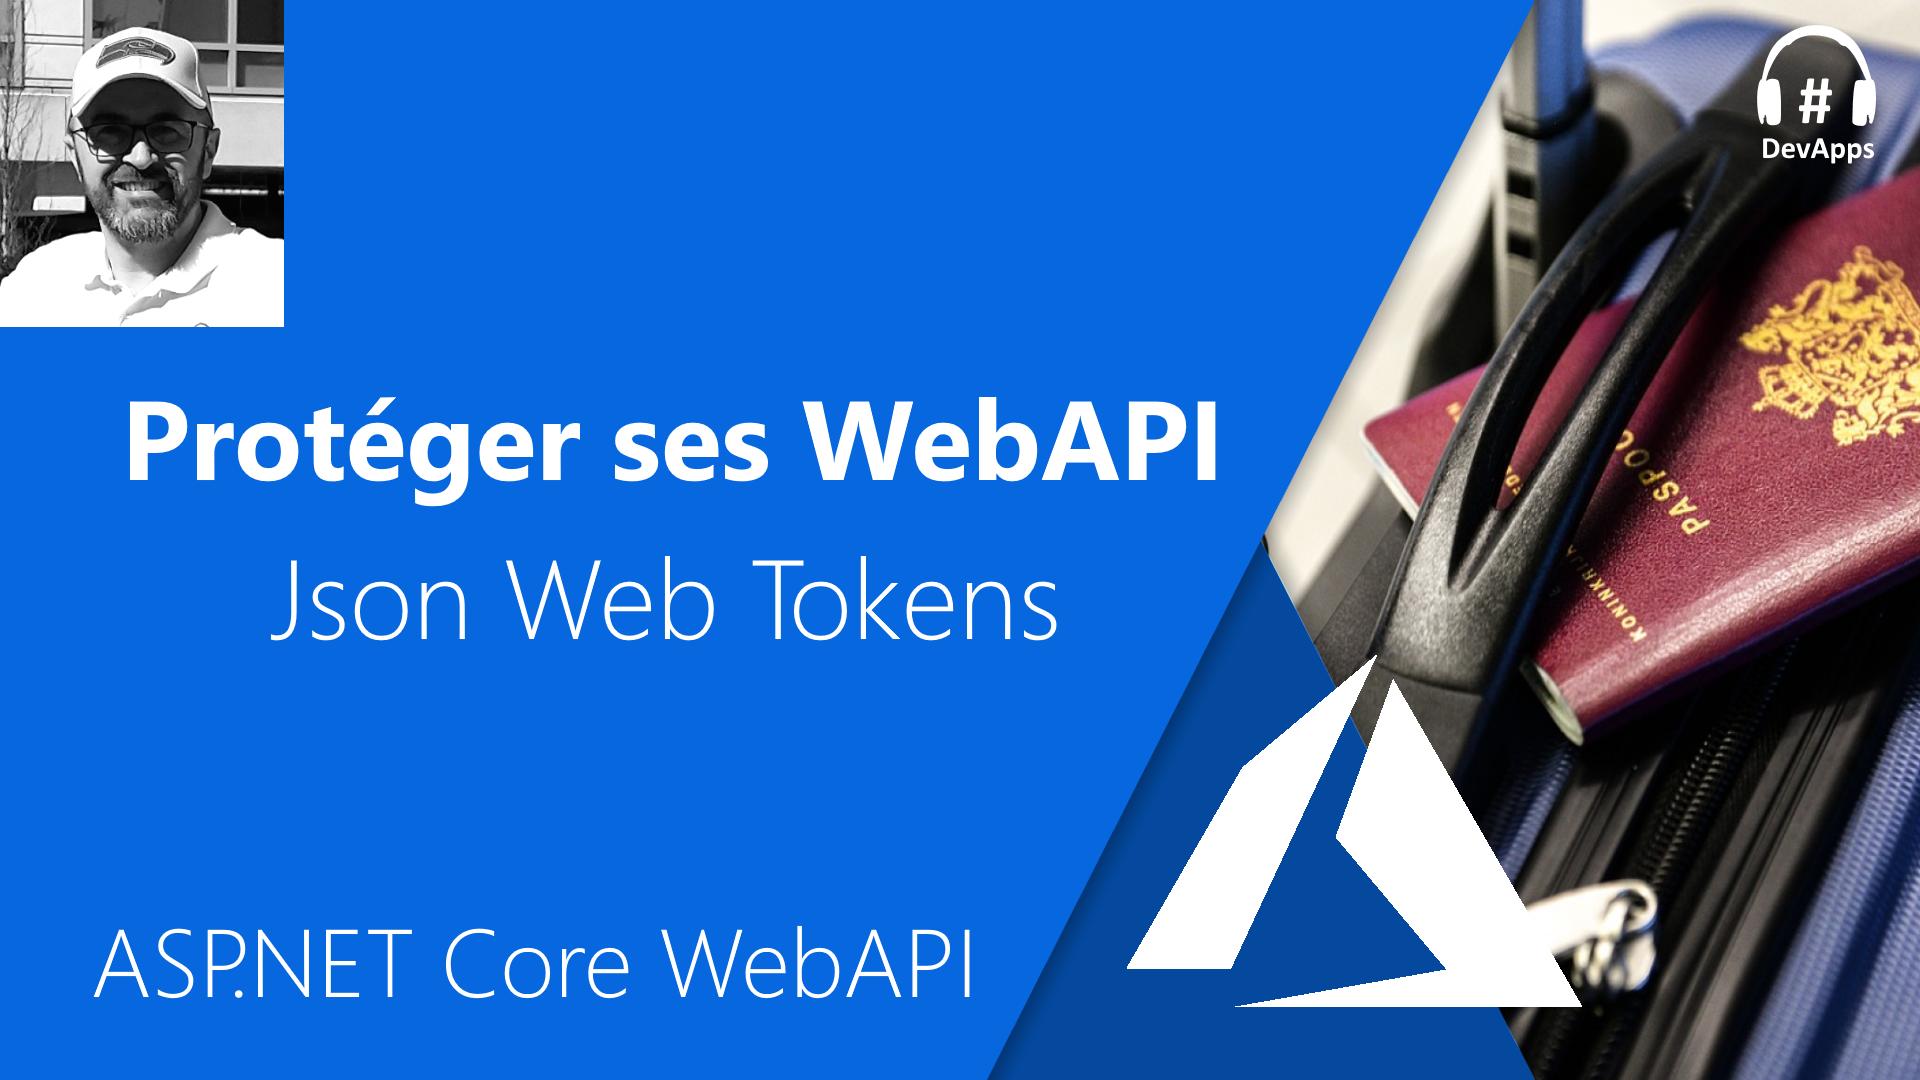 ASP.NET Core - Protéger ses WebAPI